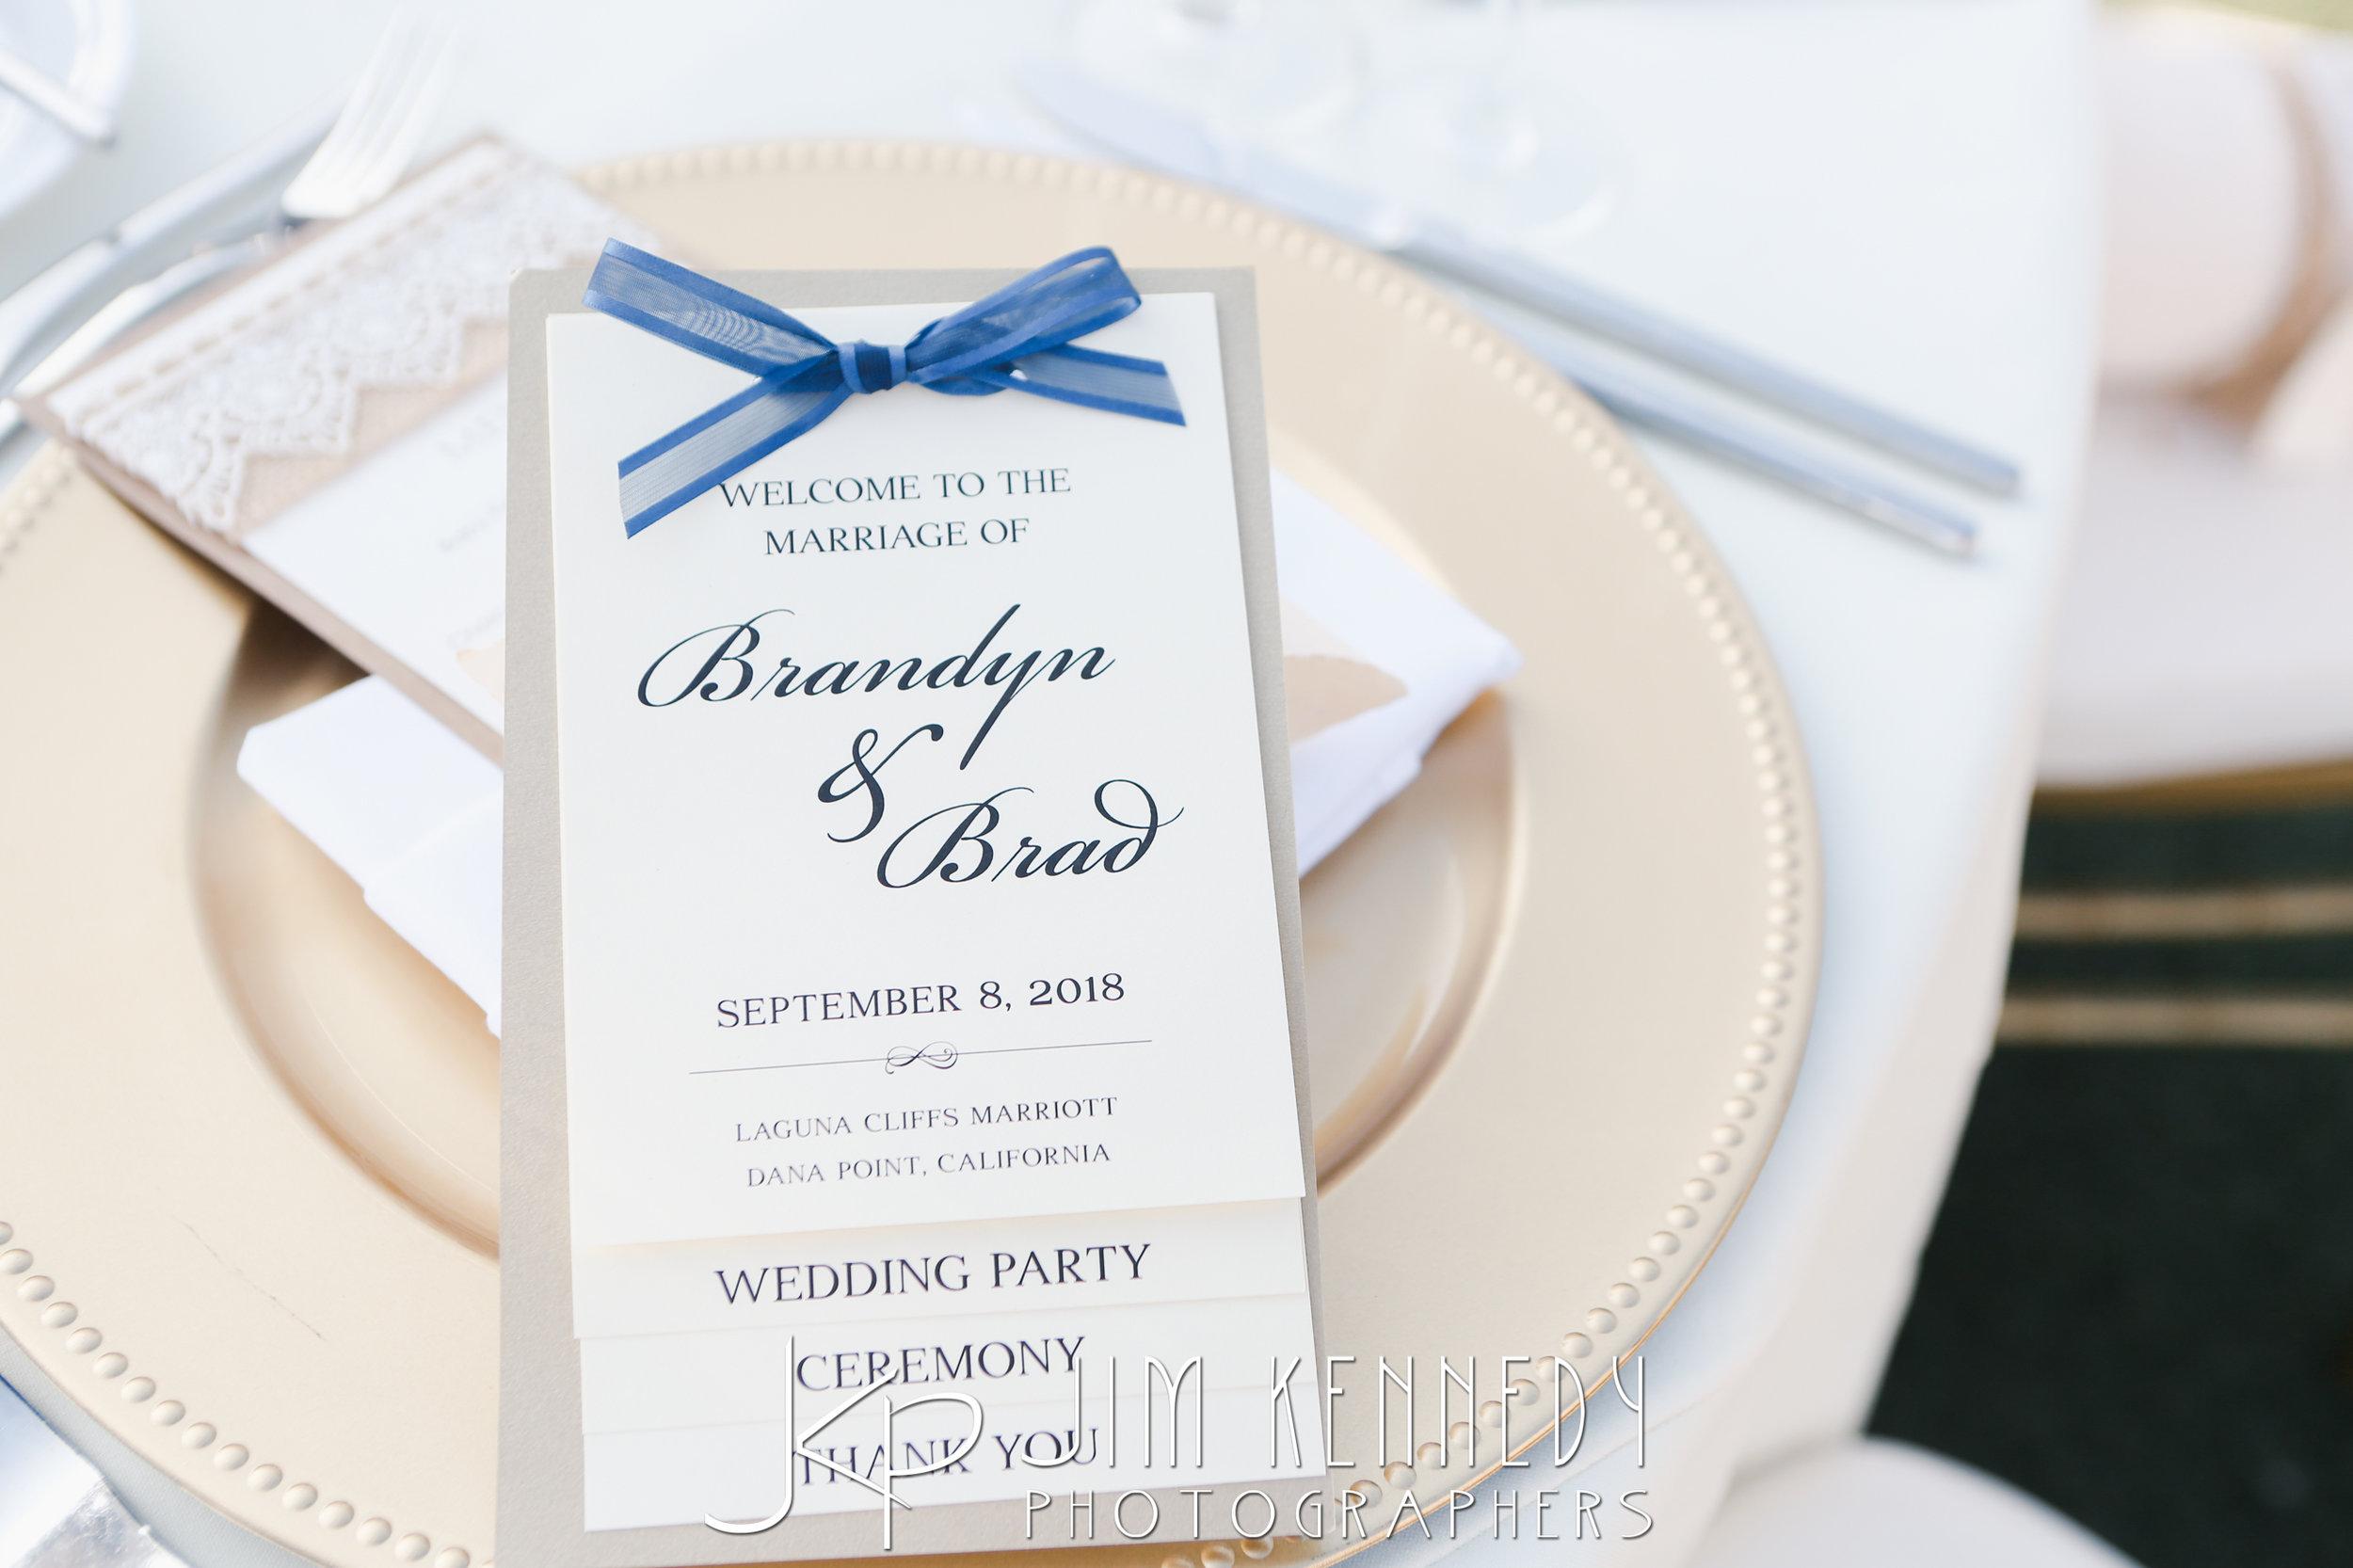 laguna_cliffs_marriott_wedding_brandyn_0131.JPG